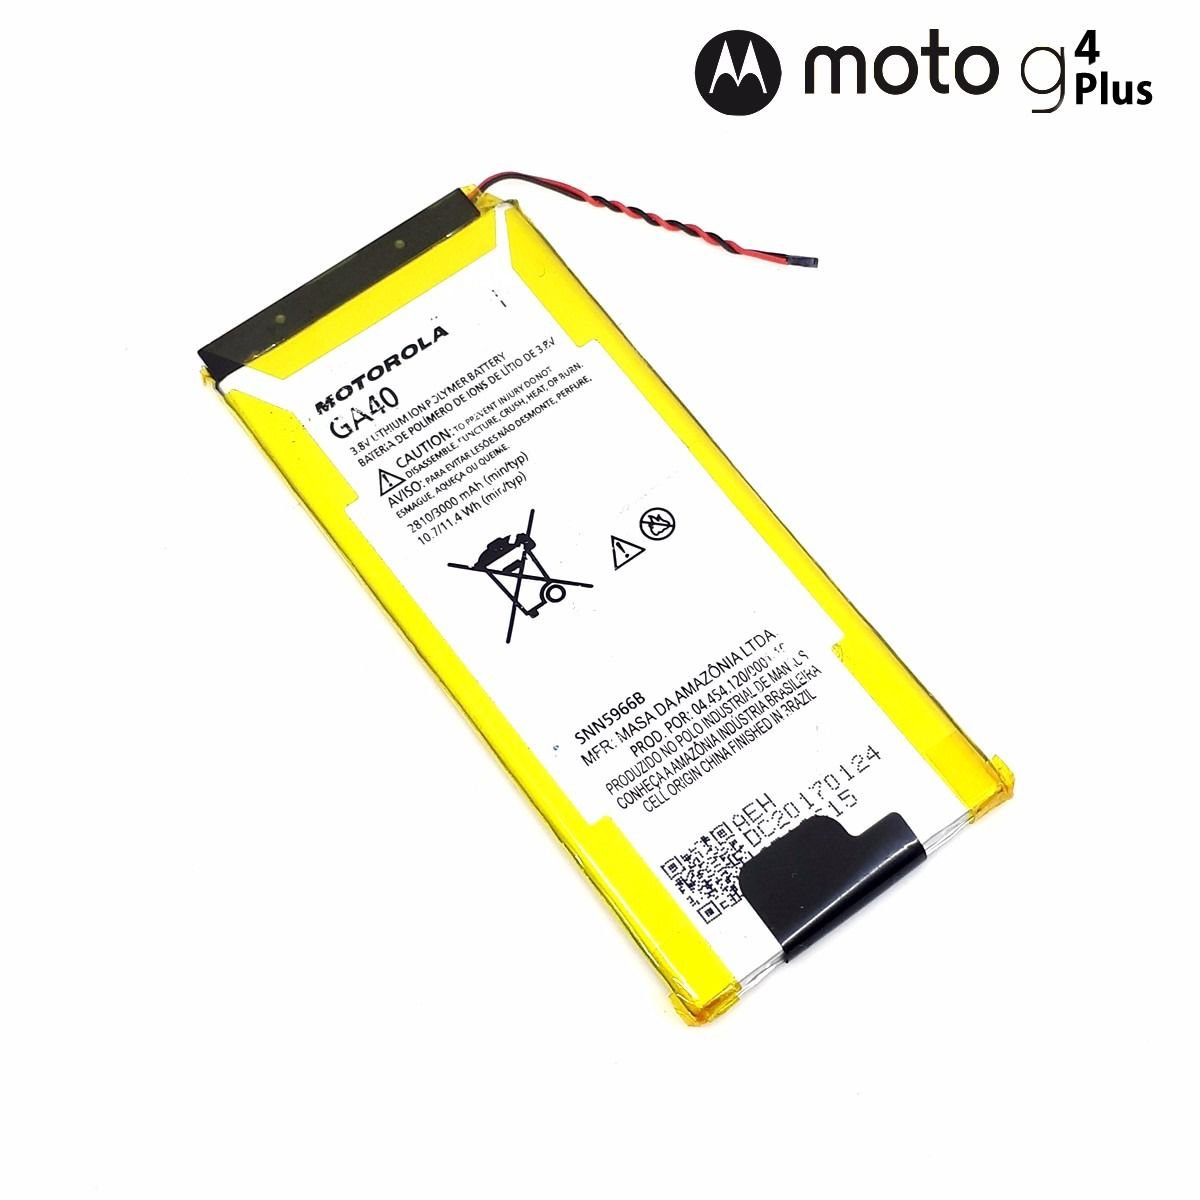 Bateria Motorola GA40 Original Moto G4 Xt1626 Xt1622 / Moto G4 Plus Xt1640  Retirada